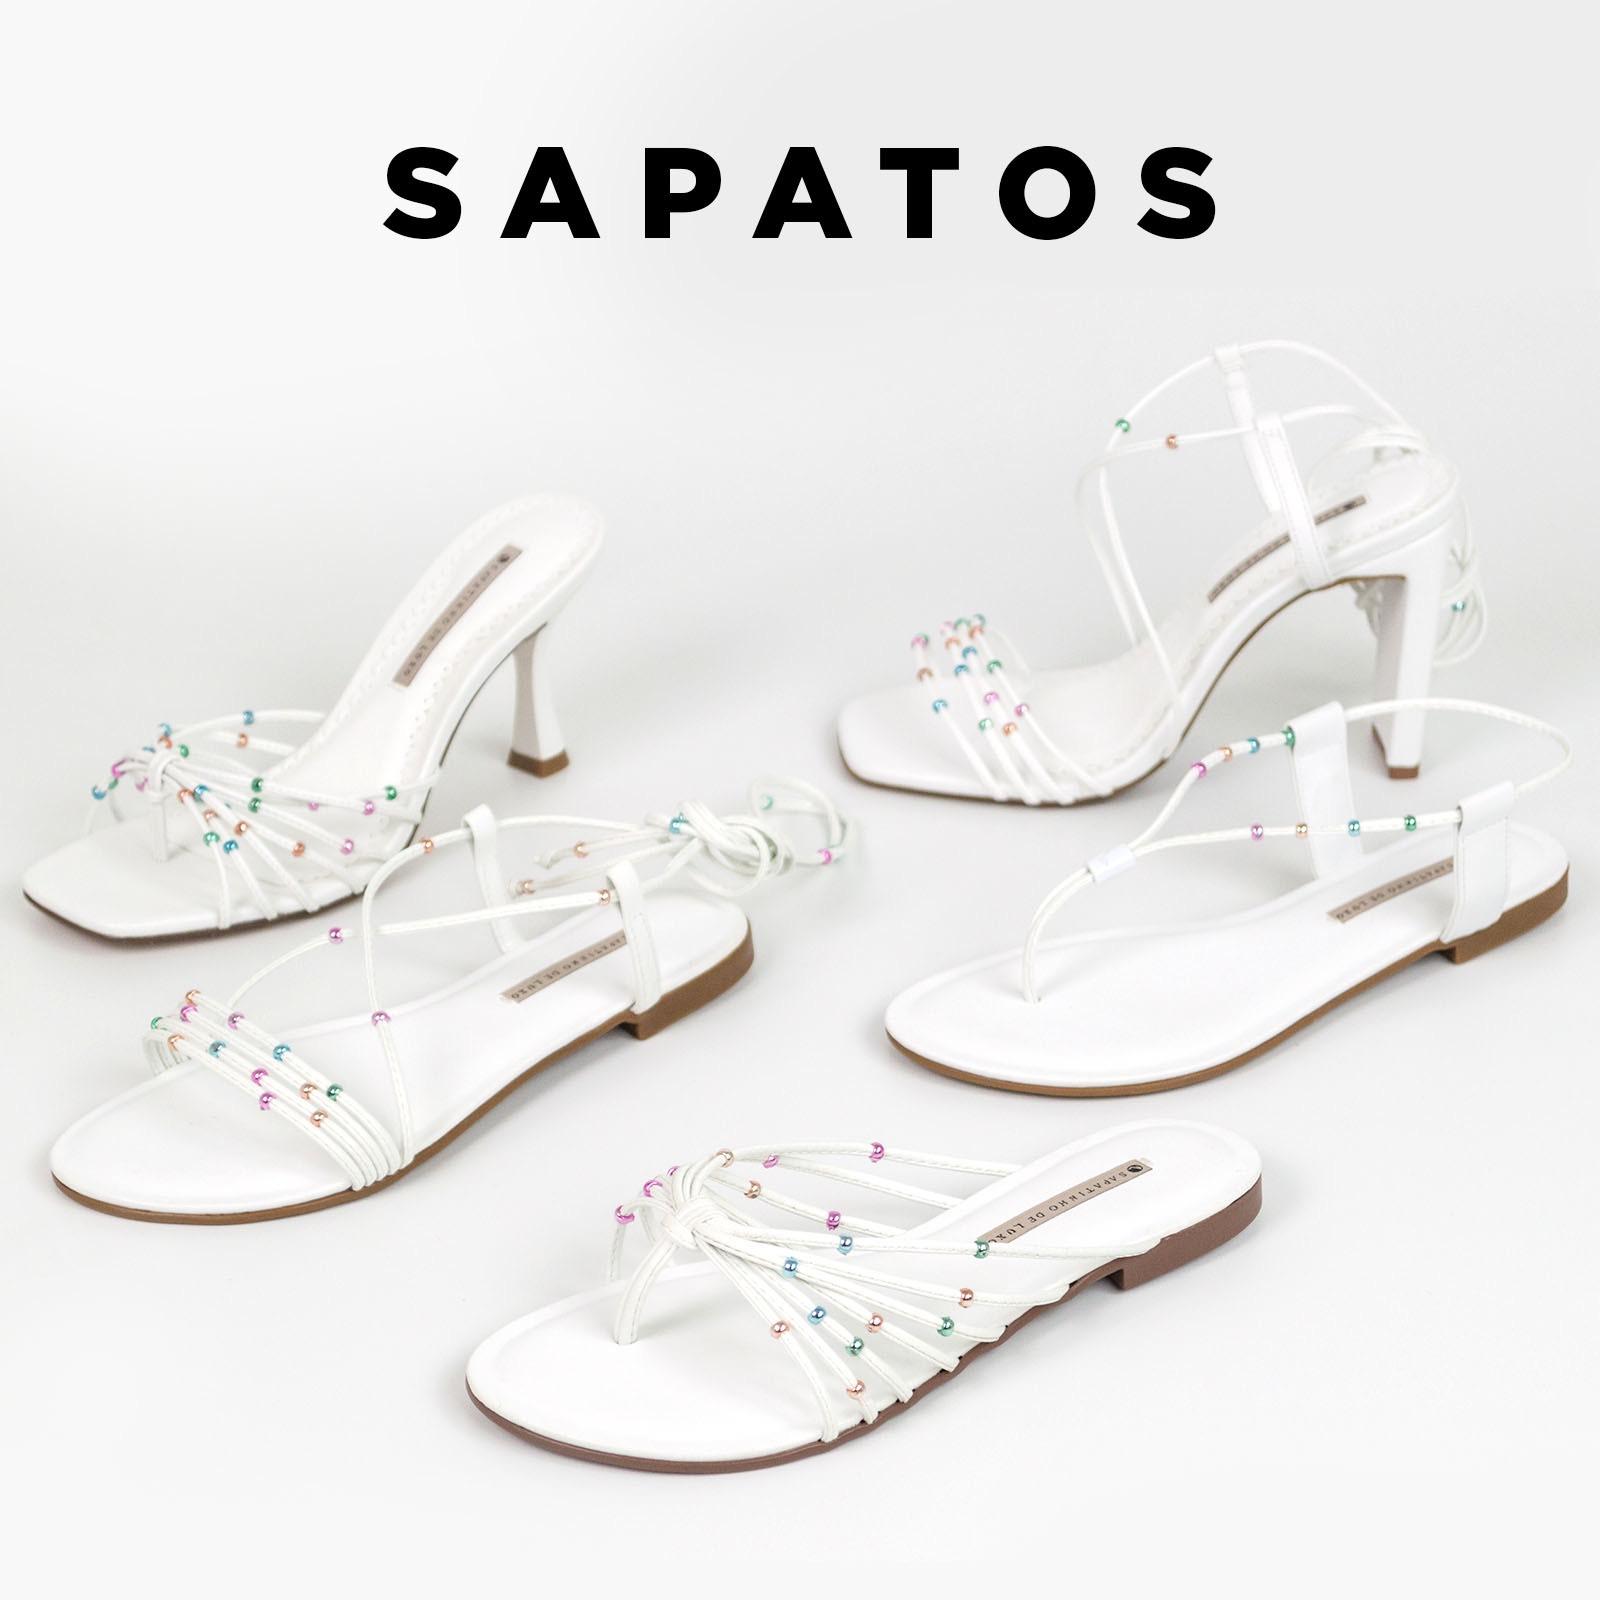 Sapatos-BannerG-1